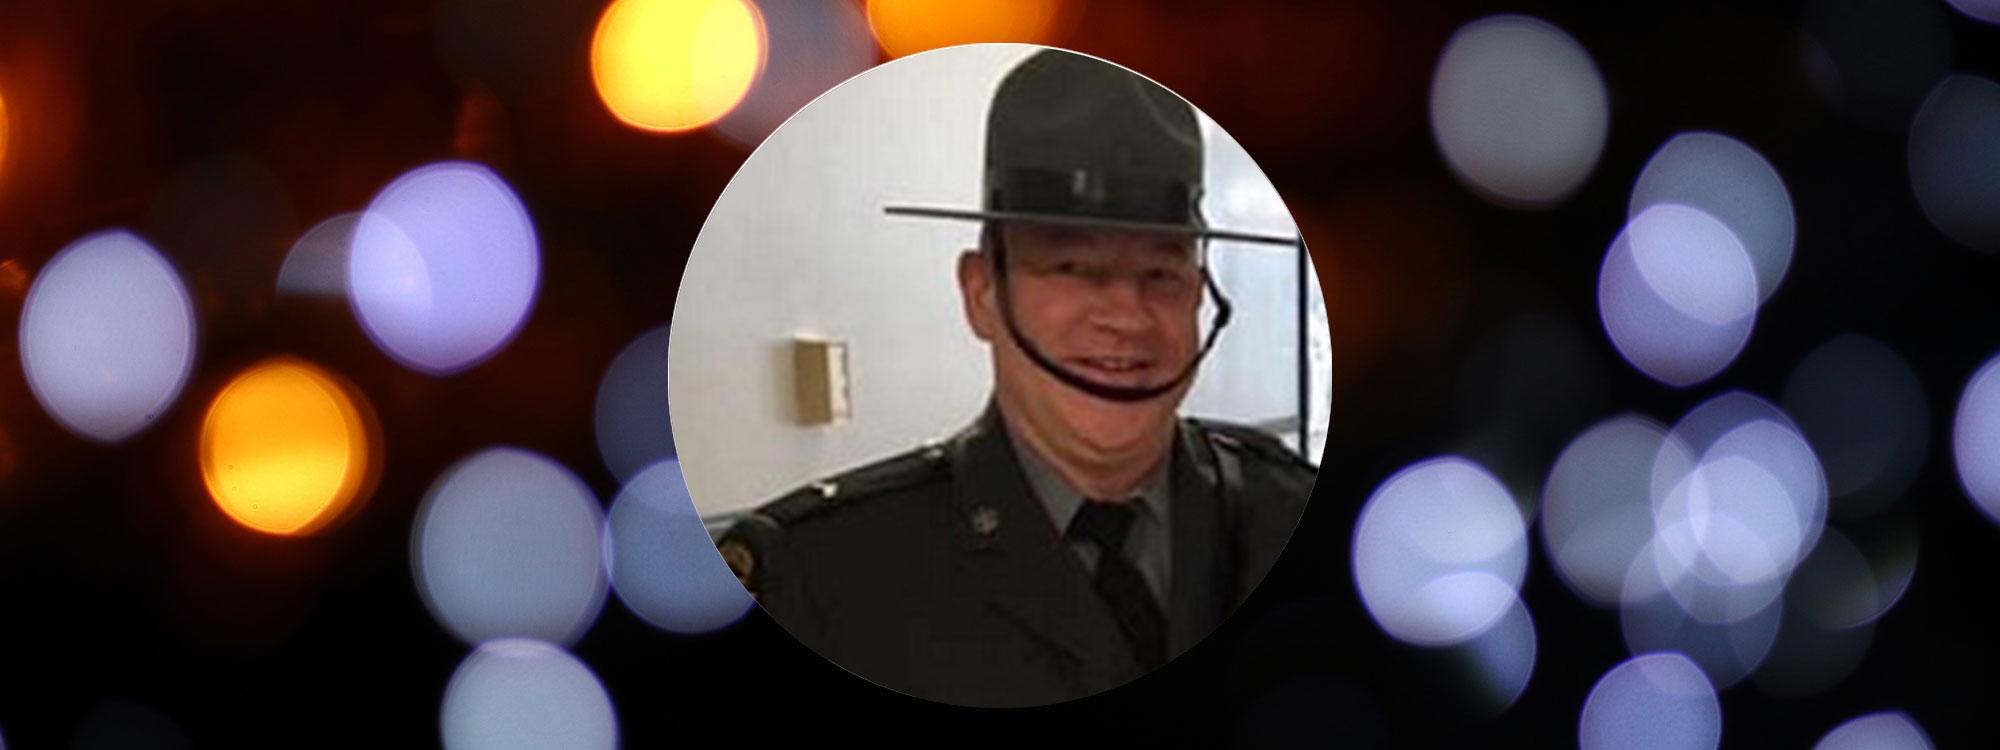 Corporal Shawn Kofluk